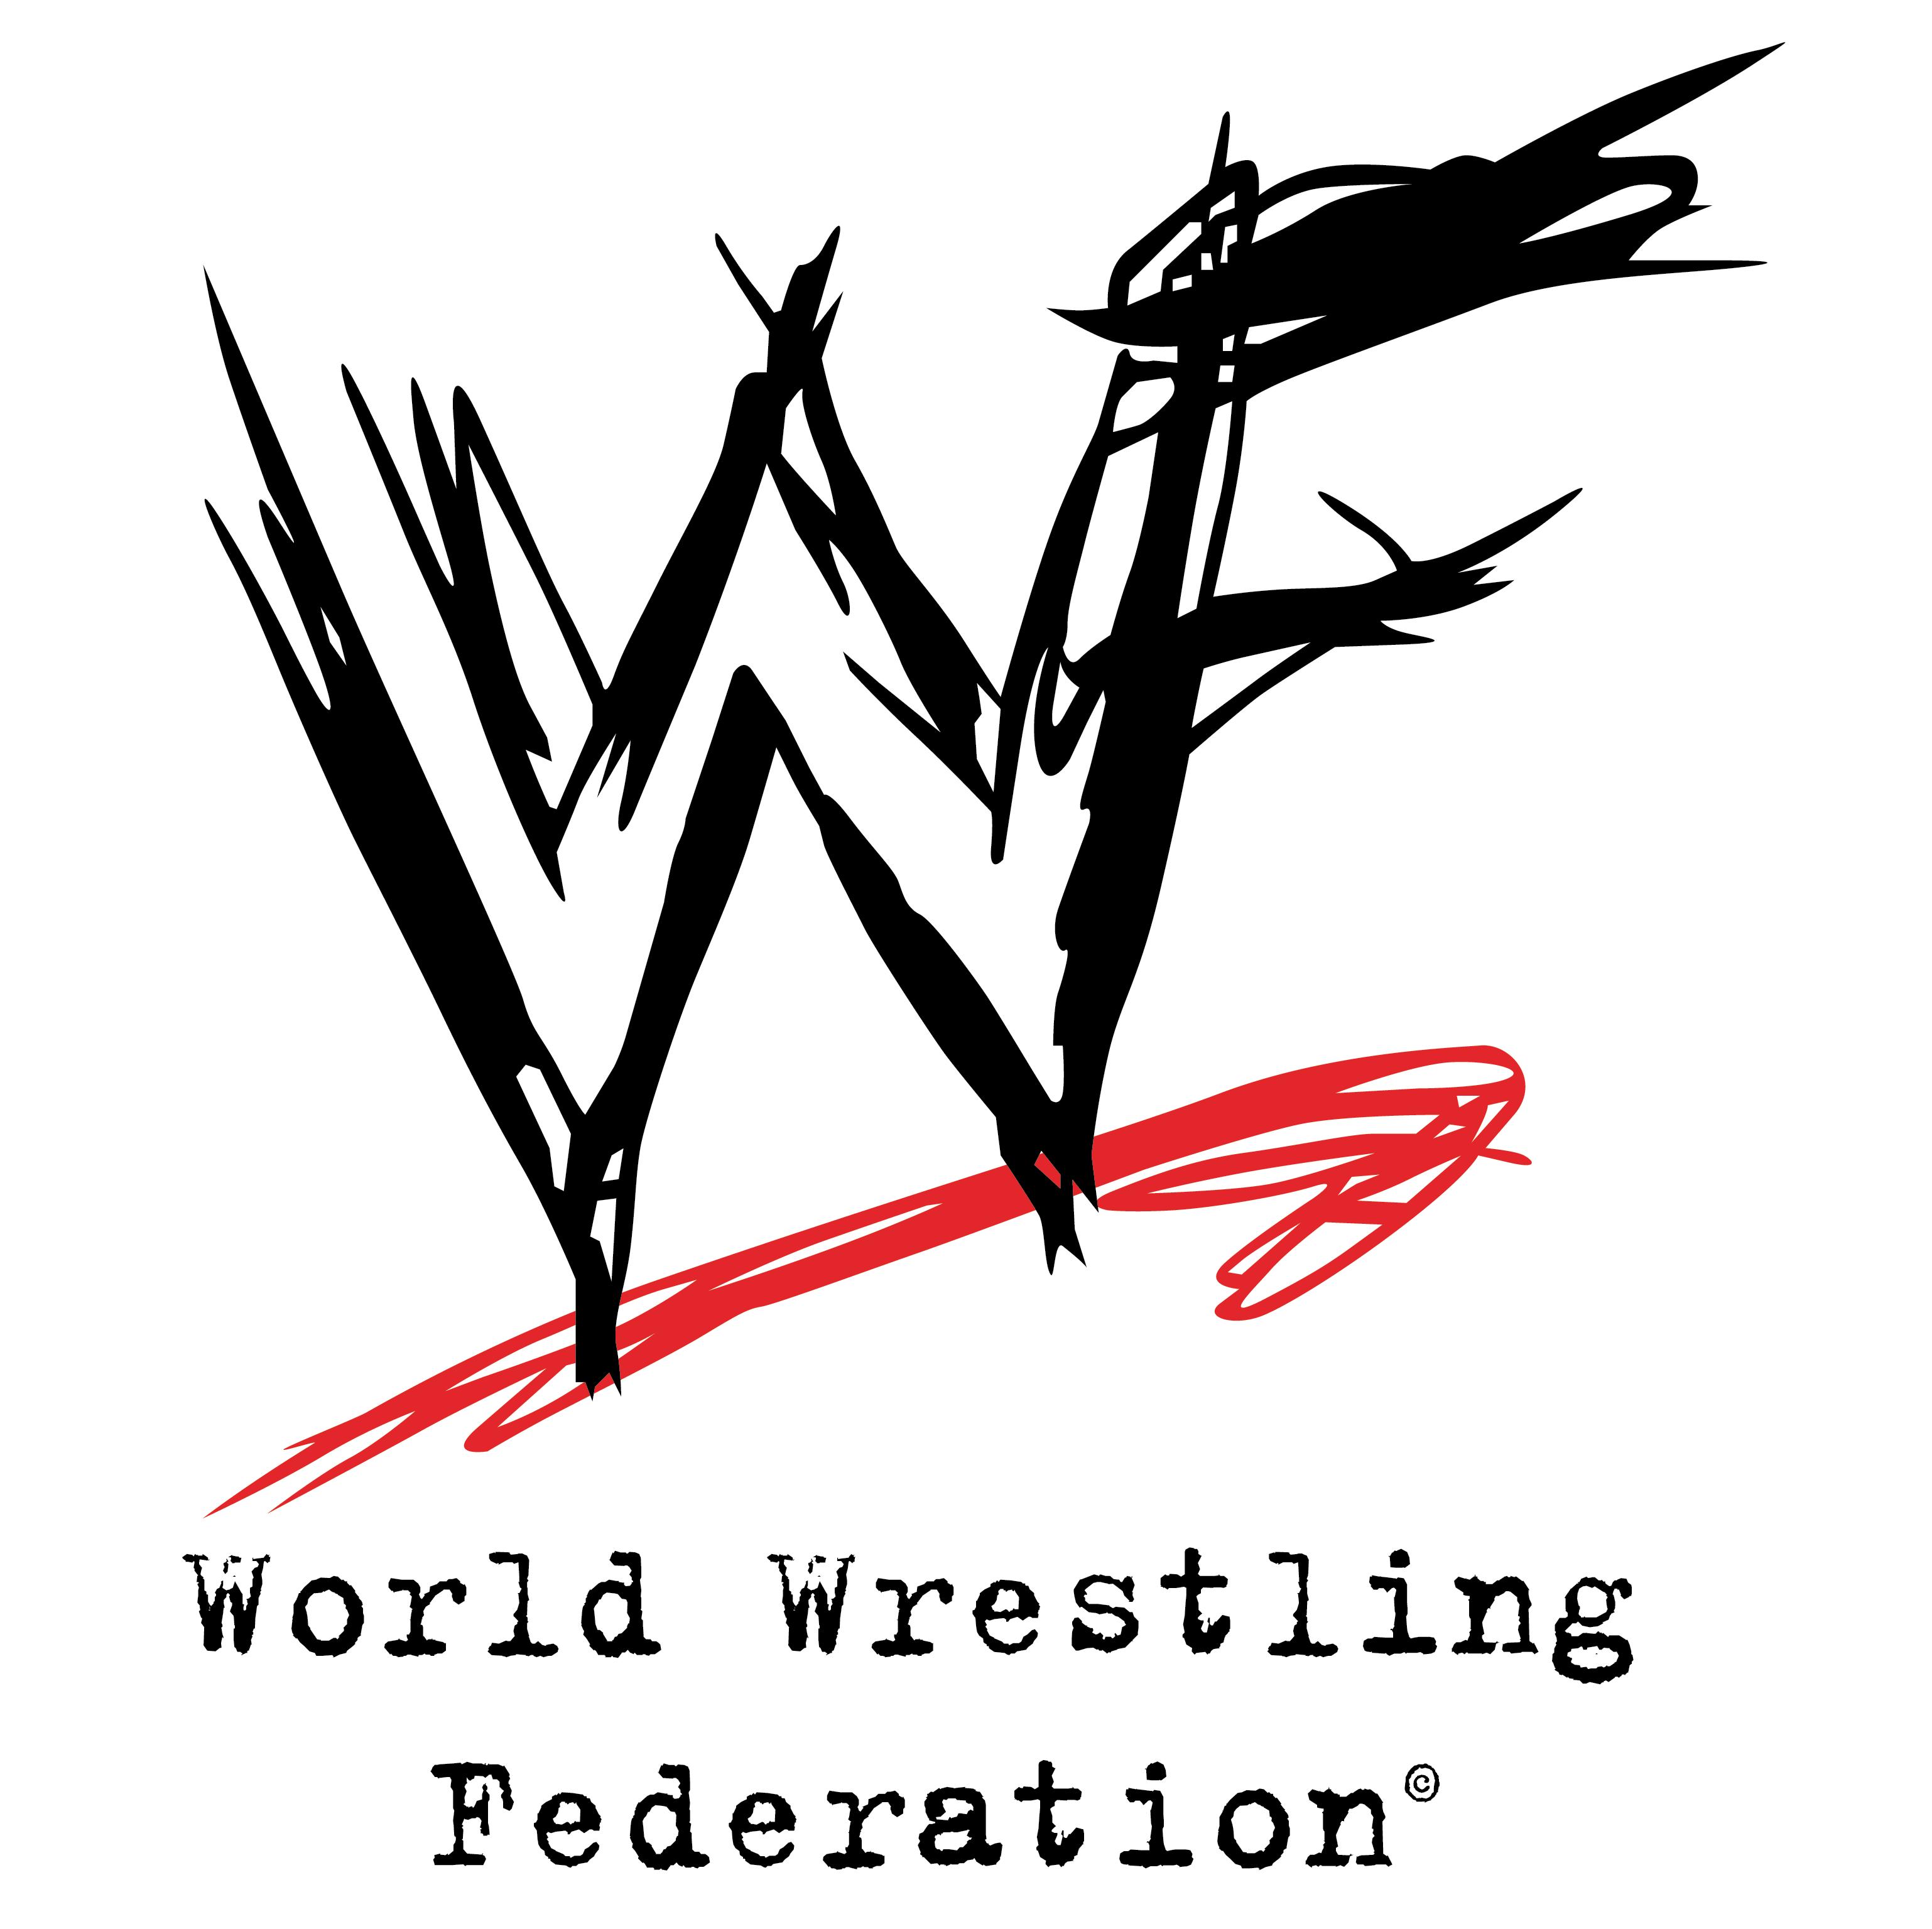 WWF / World Wrestling Federation Logo by B1ueChr1s on DeviantArt